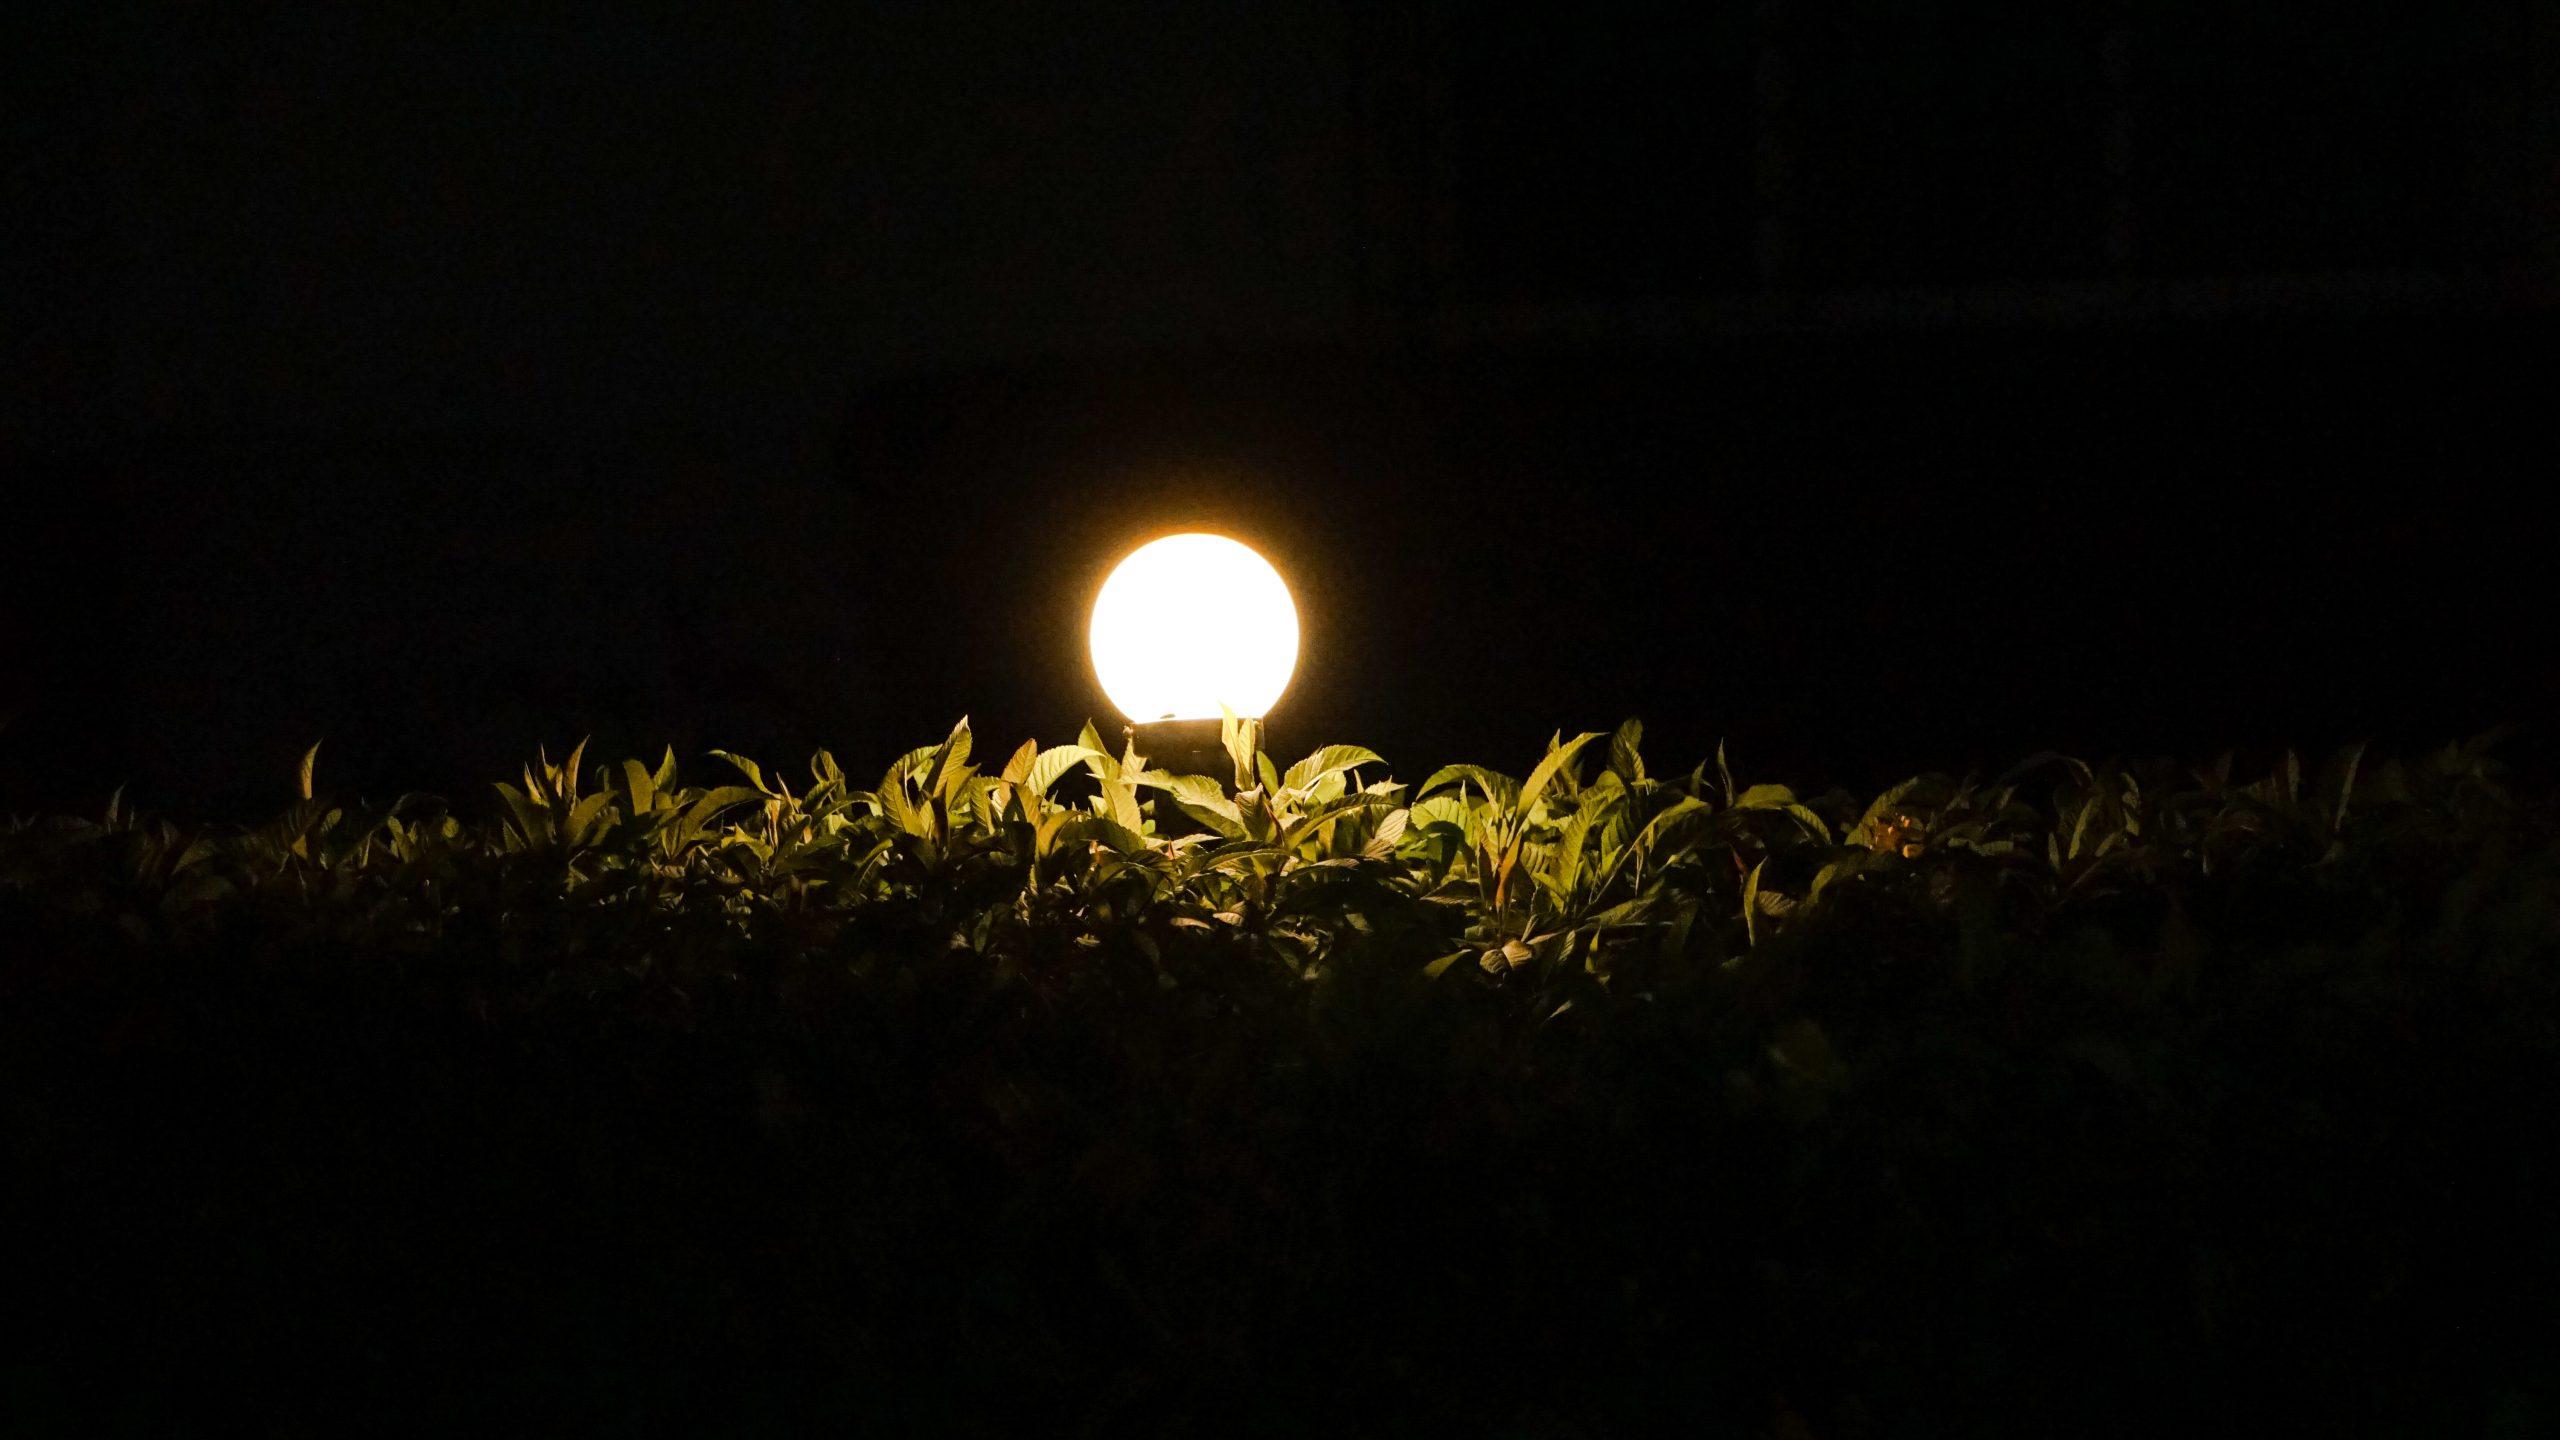 light illuminating the leaves